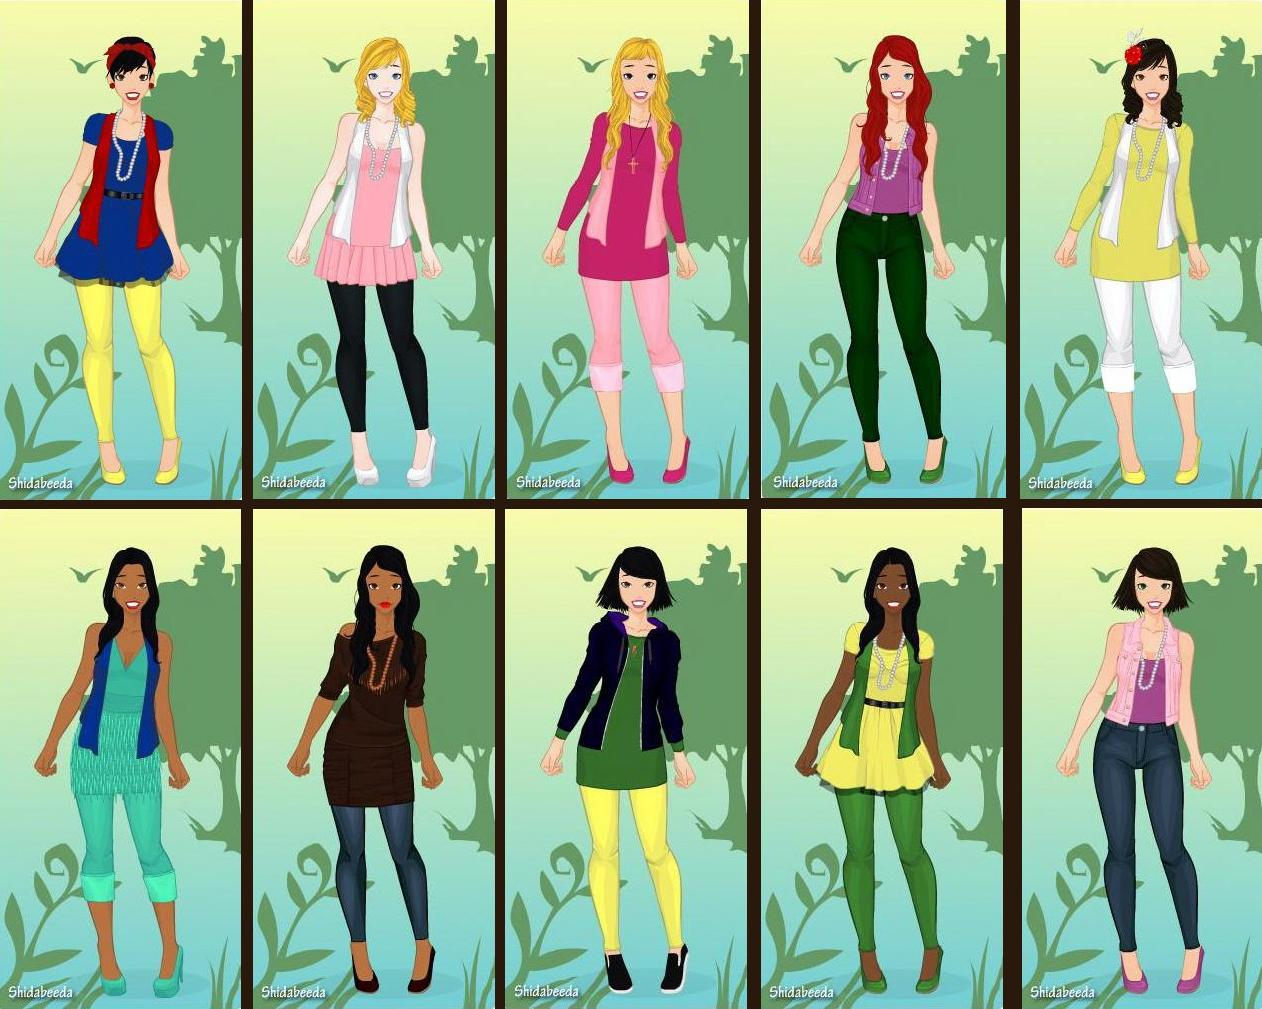 Modern Disney Princesses by ArielxJim08 on DeviantArt